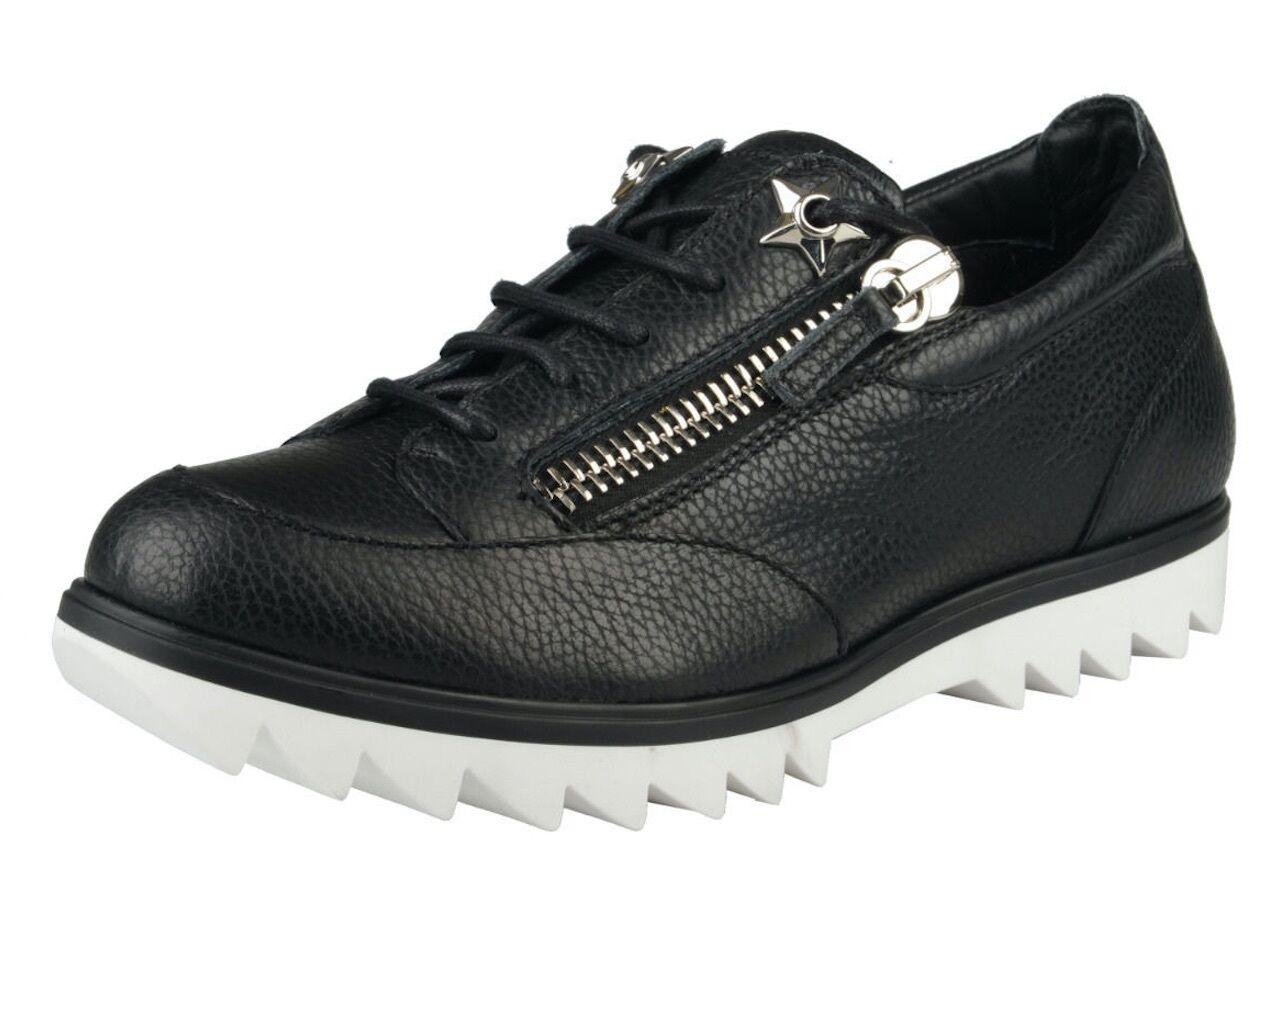 Giuseppe Zanotti Toky SC femmes Lindos-vagues en cuir noir fashion Baskets sz. 6